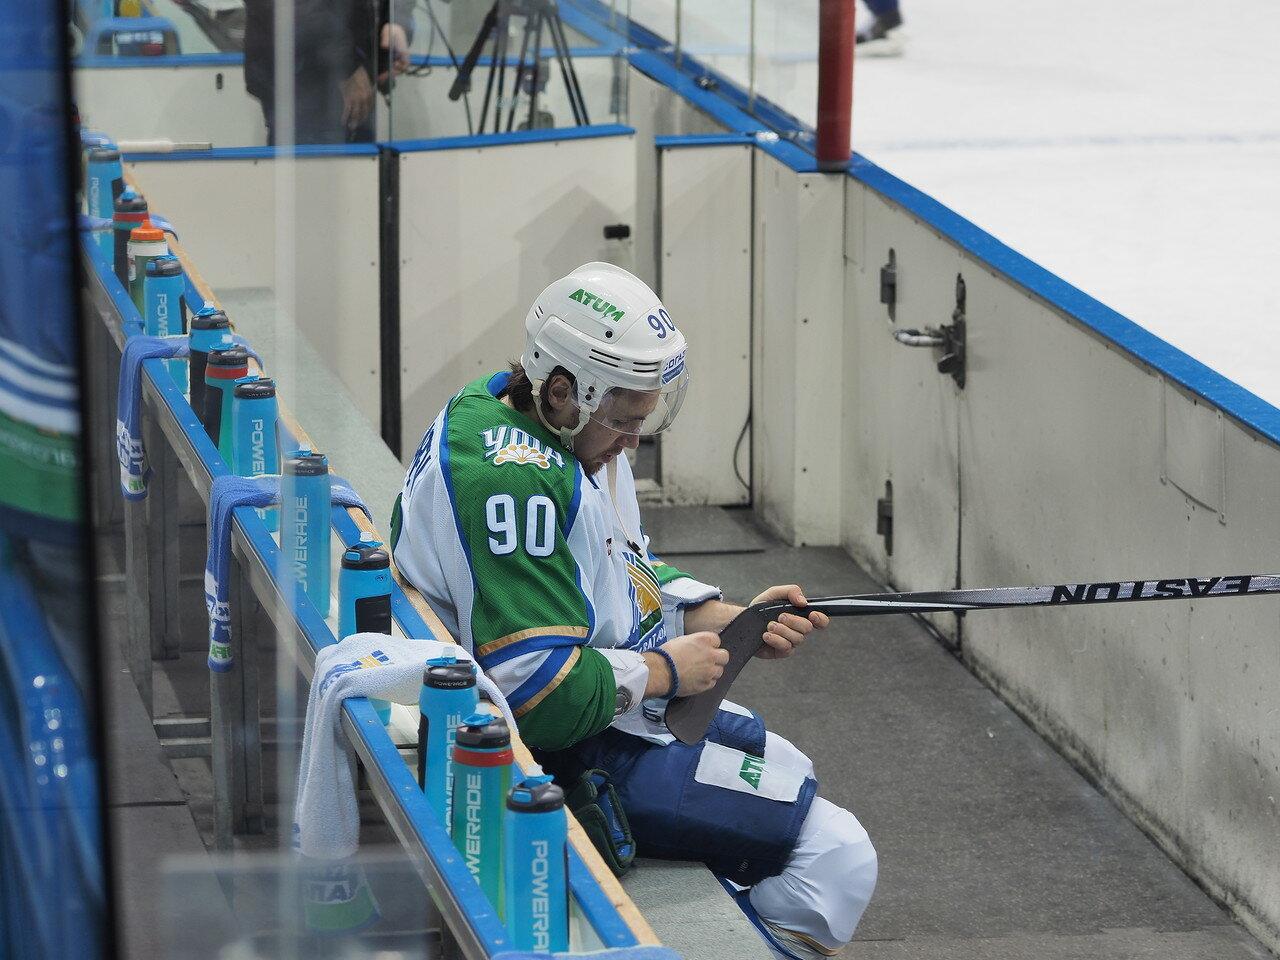 1Плей-офф 2016 Восток Финал Металлург - Салават Юлаев 25.03.2016